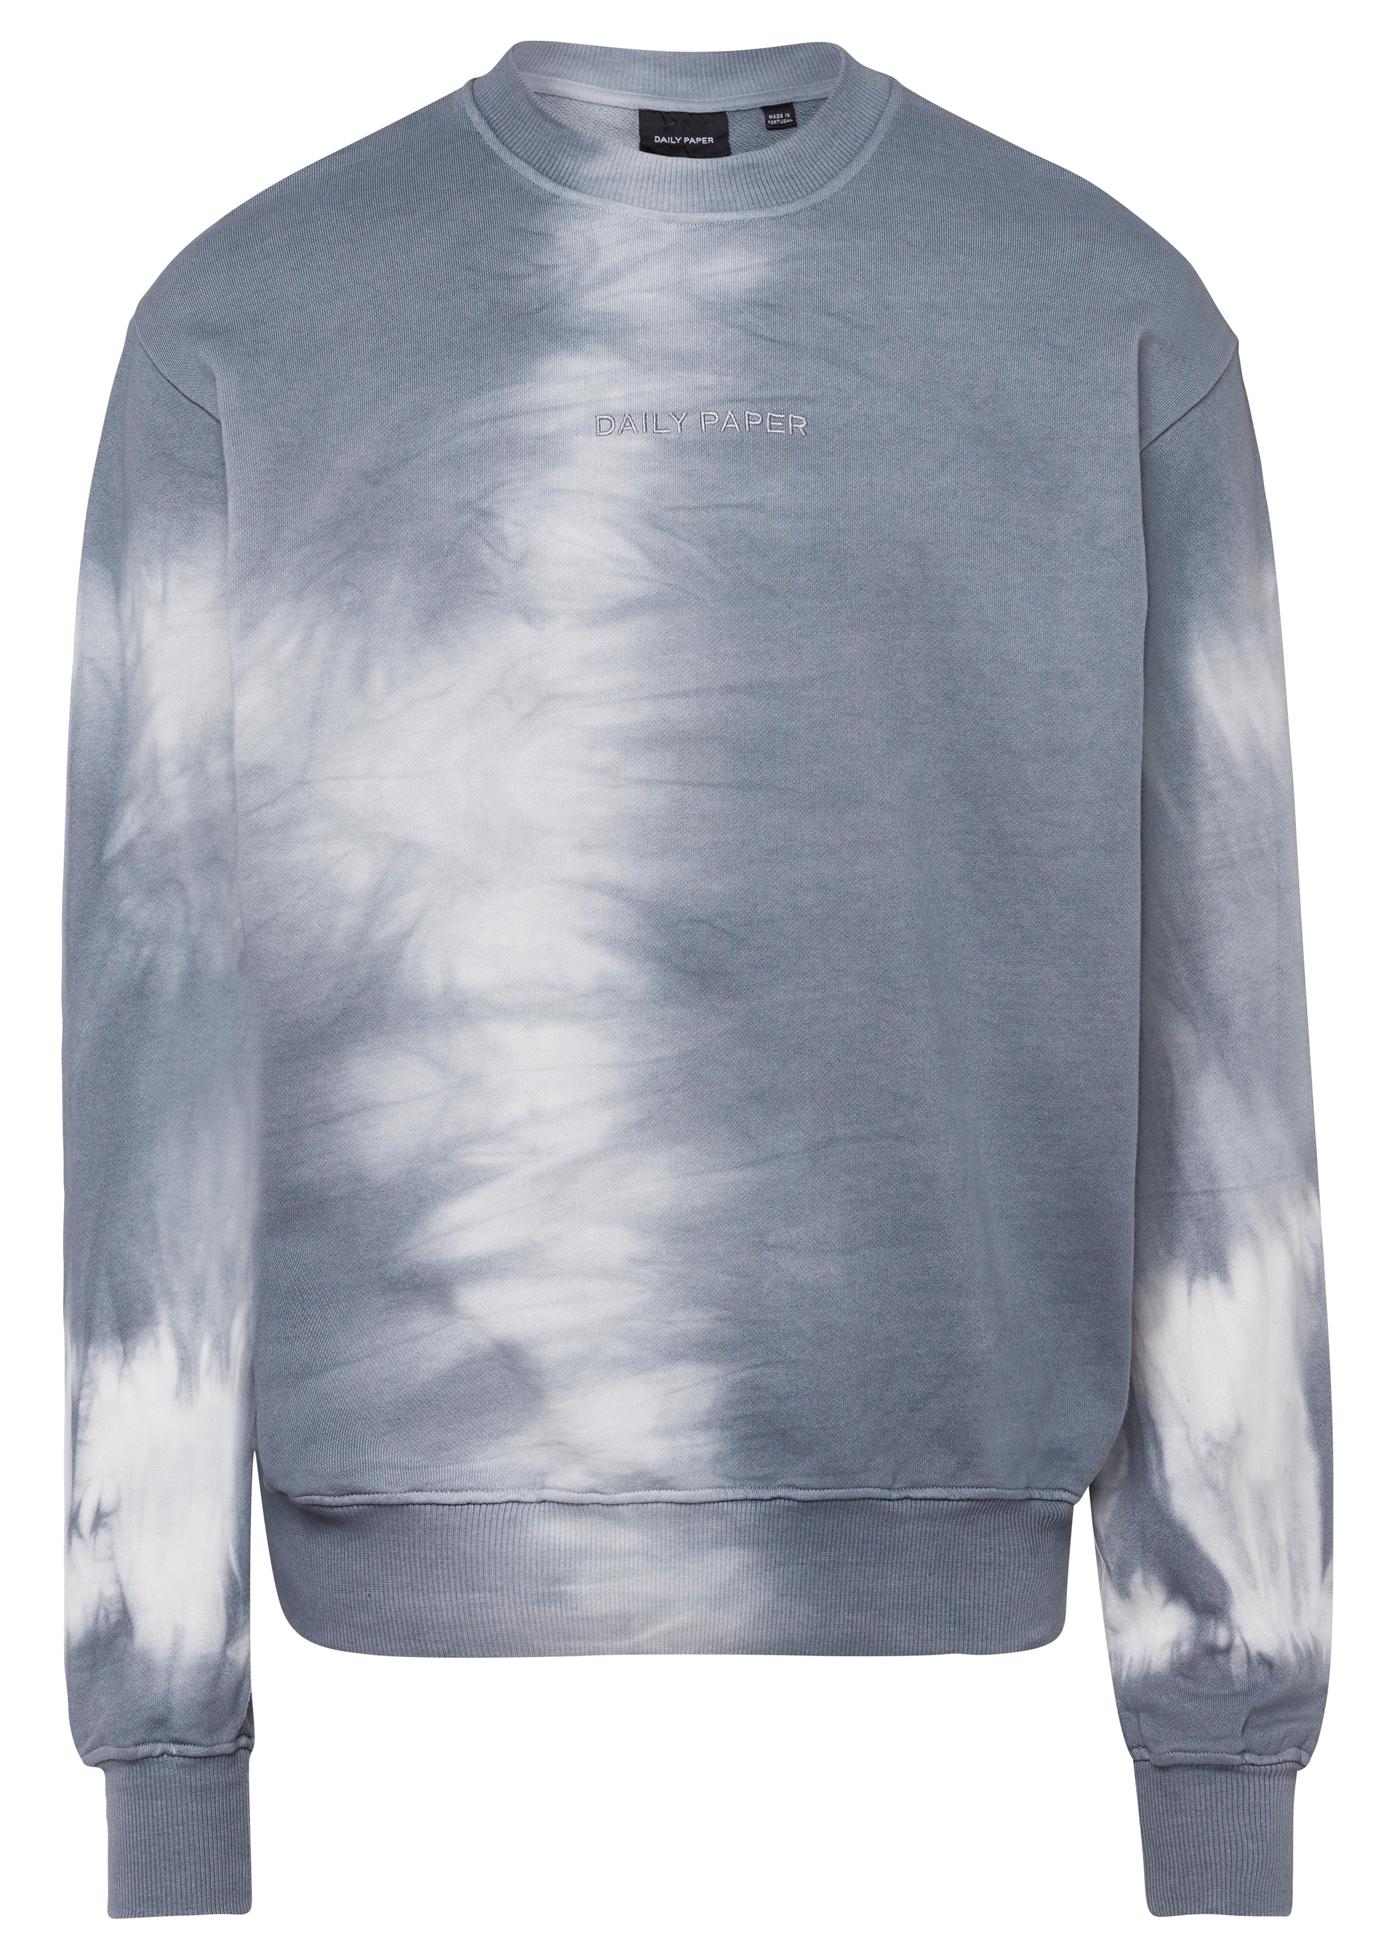 lennox sweater image number 0